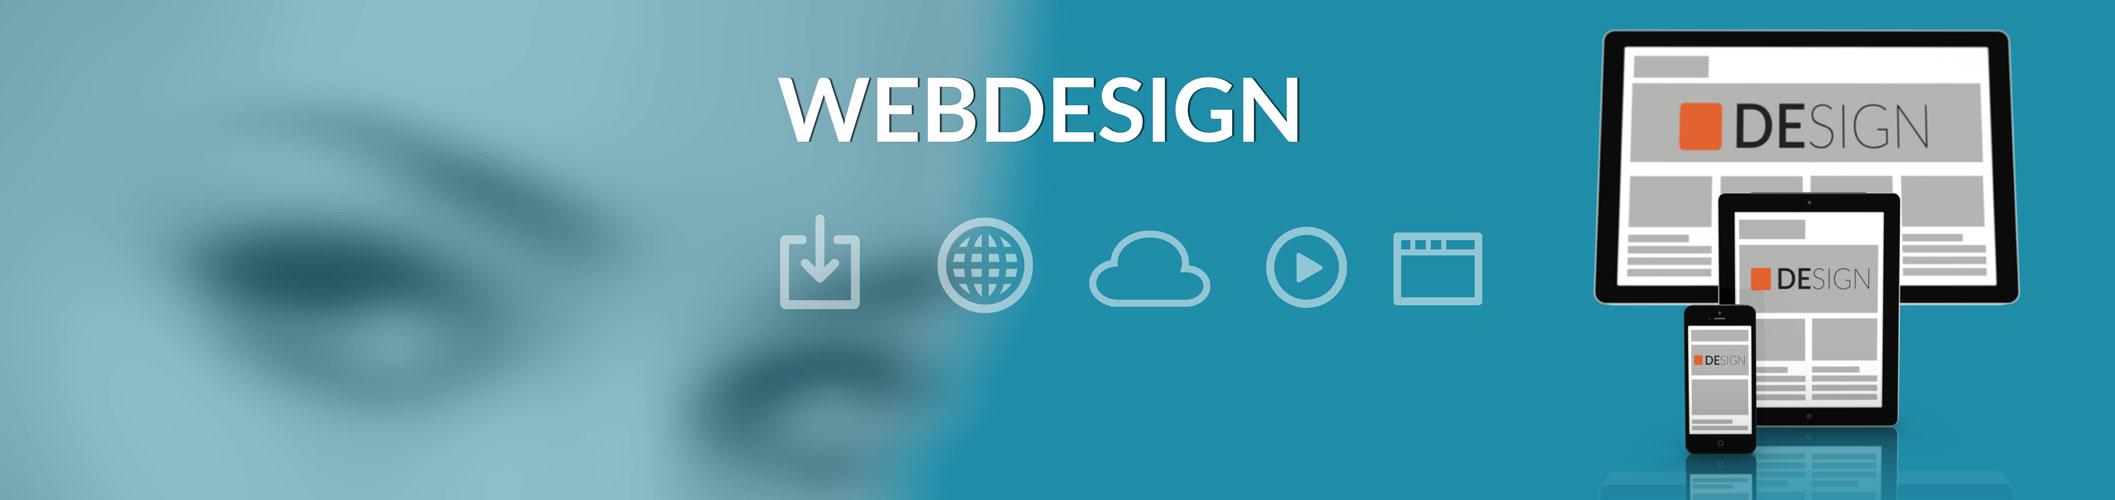 banner-webdesign-4